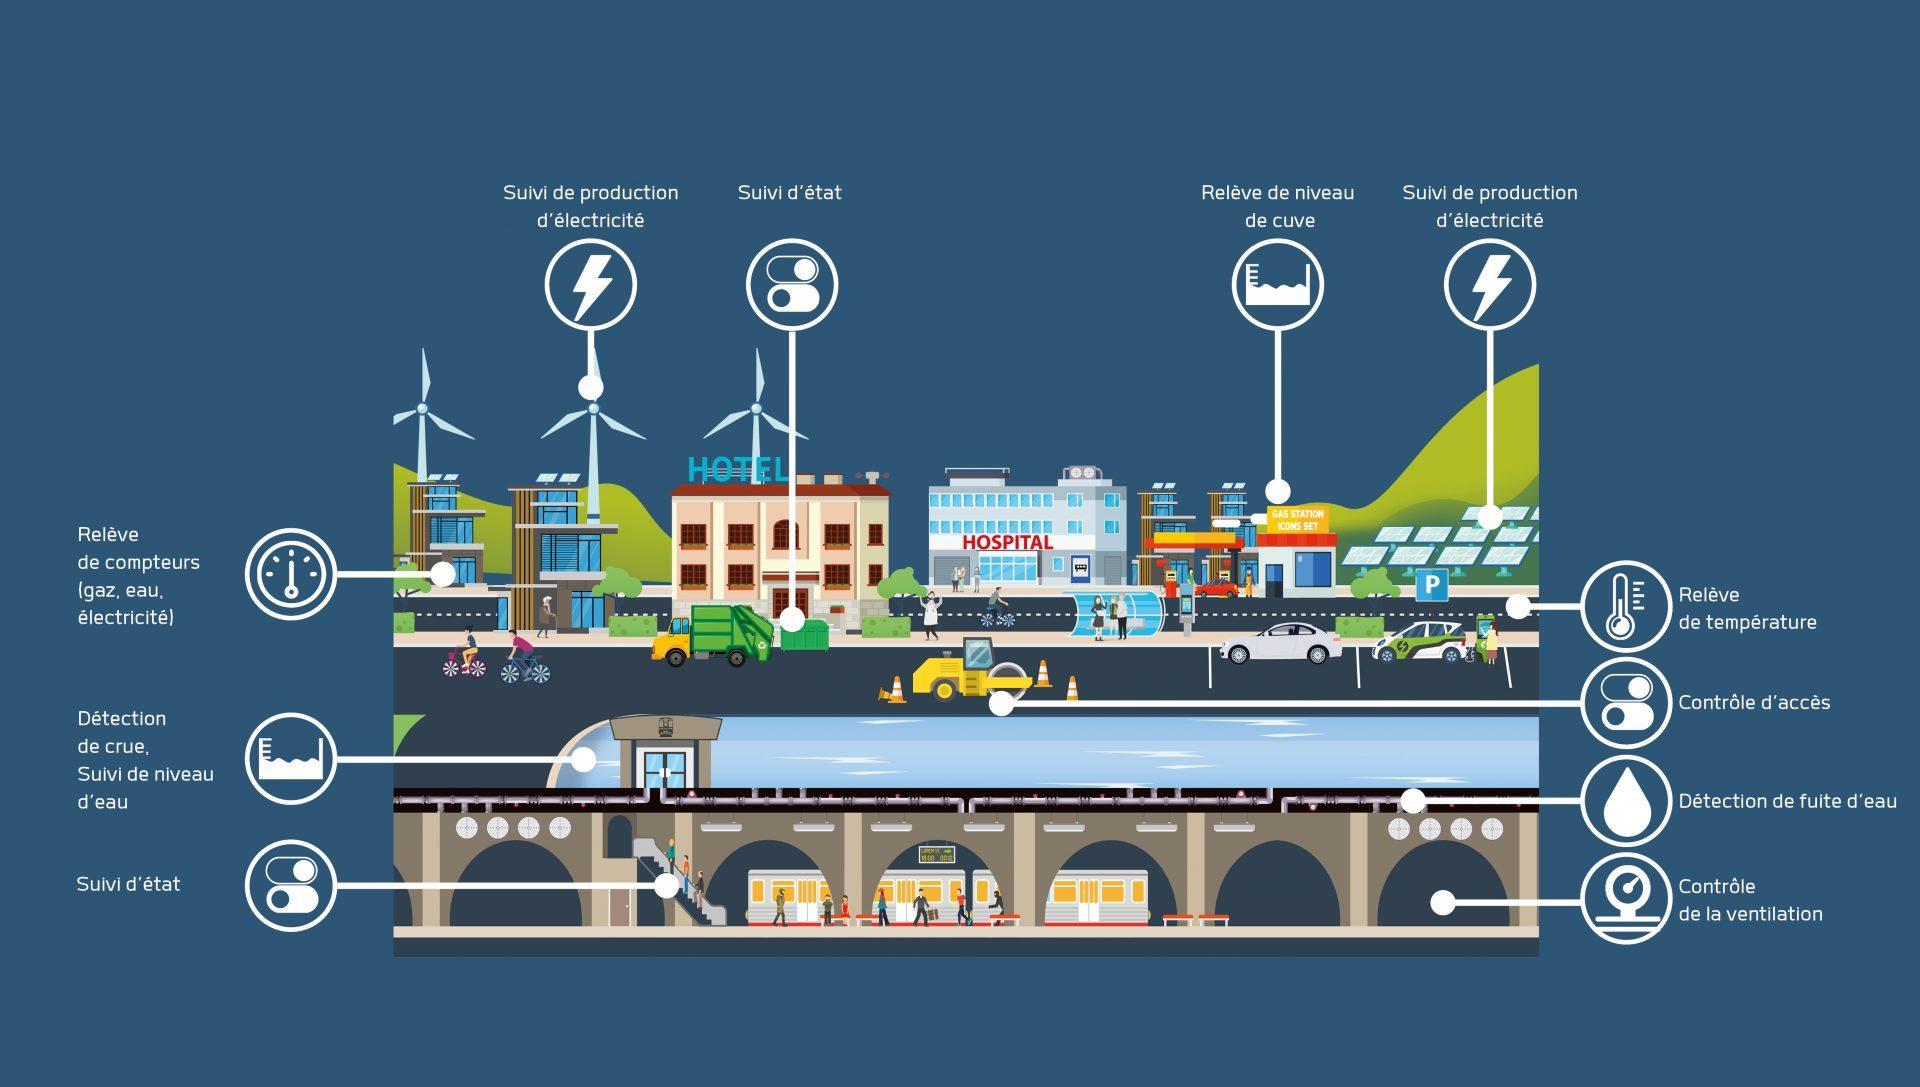 Smart City, cille intelligente, applications, iot, use cases, lpwan, lorawan, sigfox